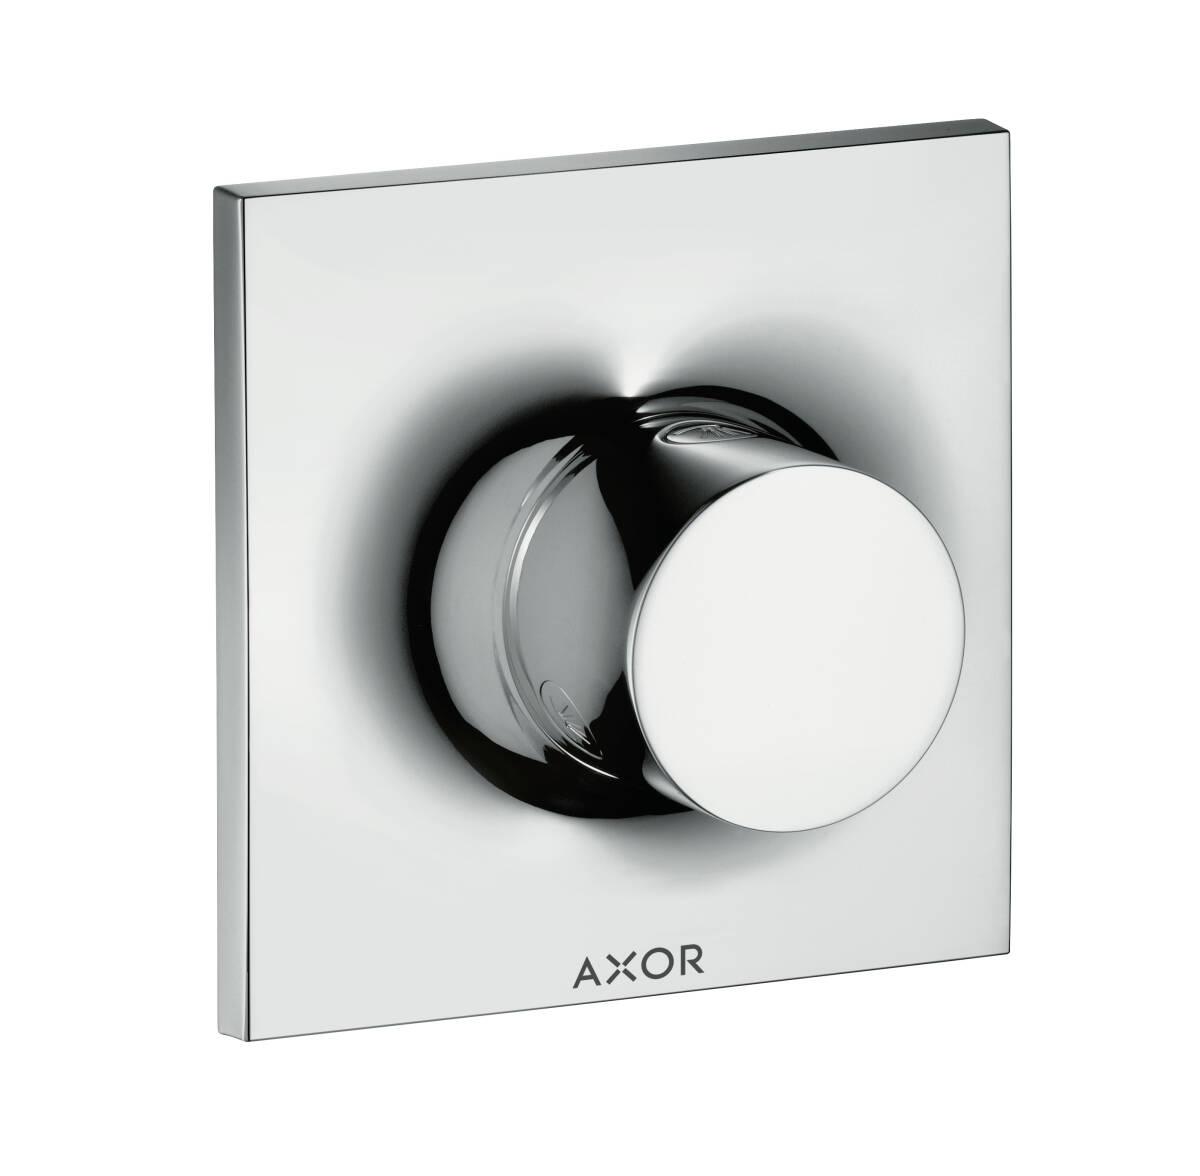 Shut-off/ diverter valve Trio/ Quattro for concealed installation, Chrome, 18730000